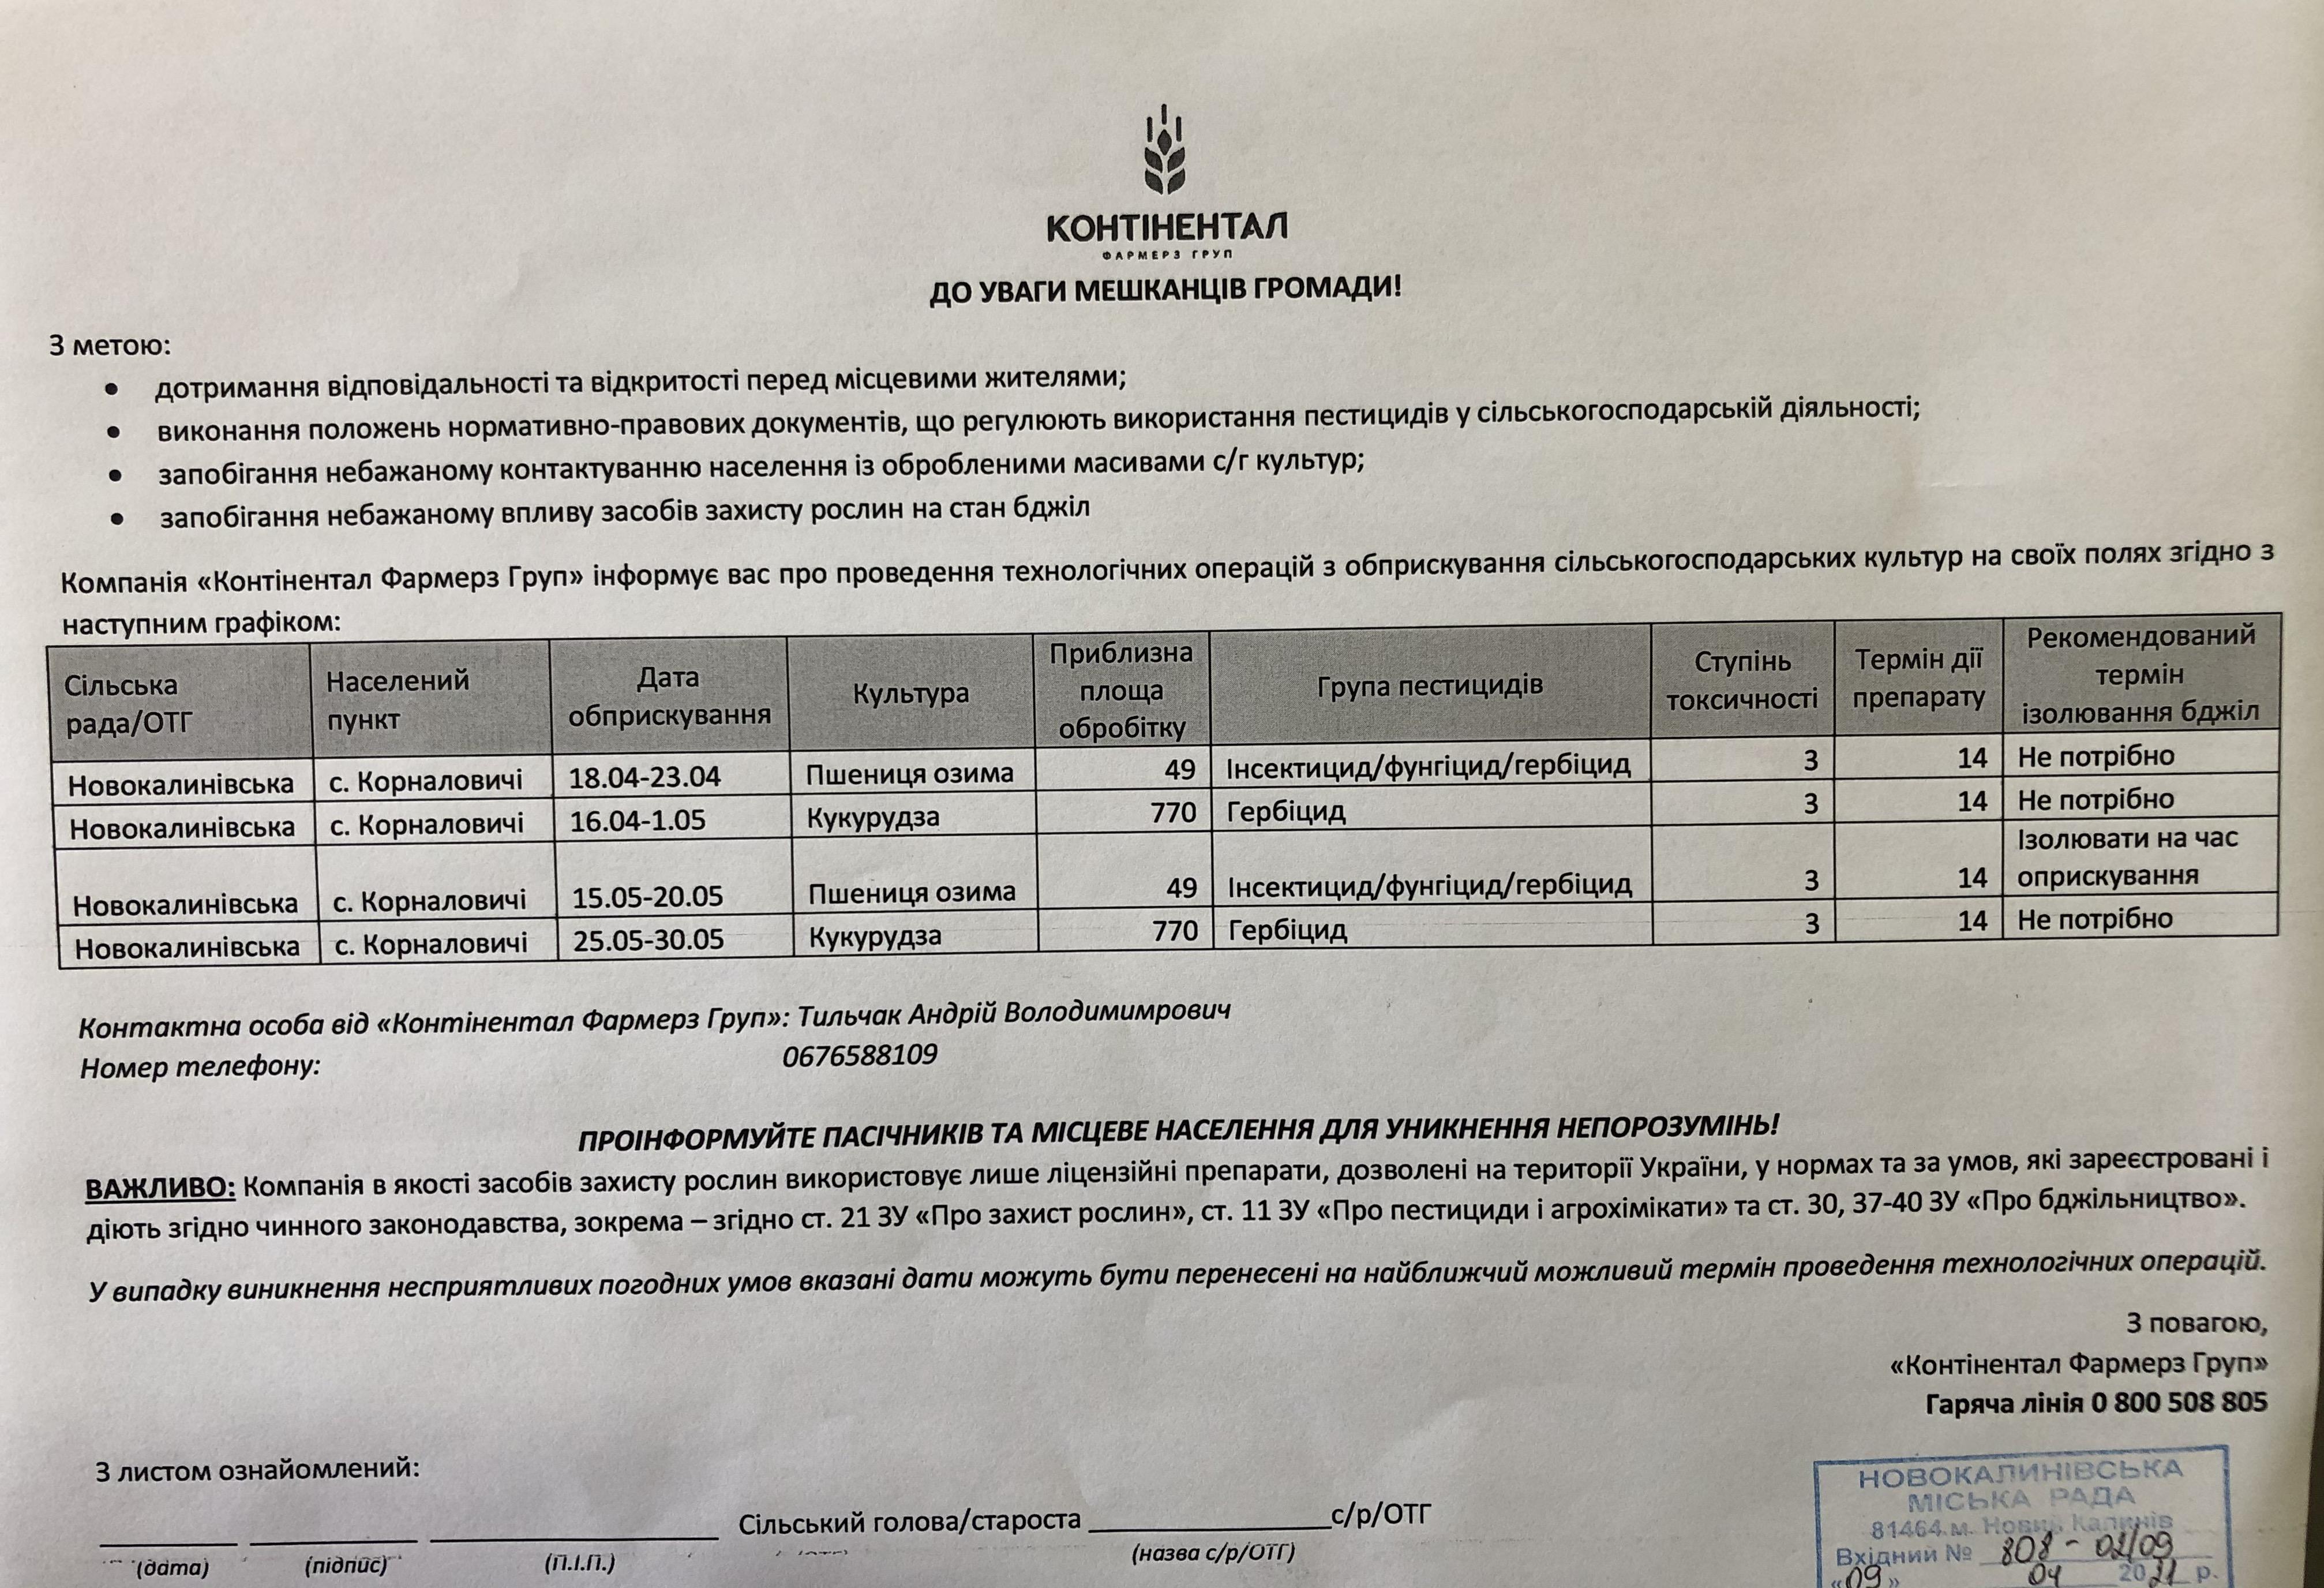 """KONTINENTAL FARMERZ HRUP""12"